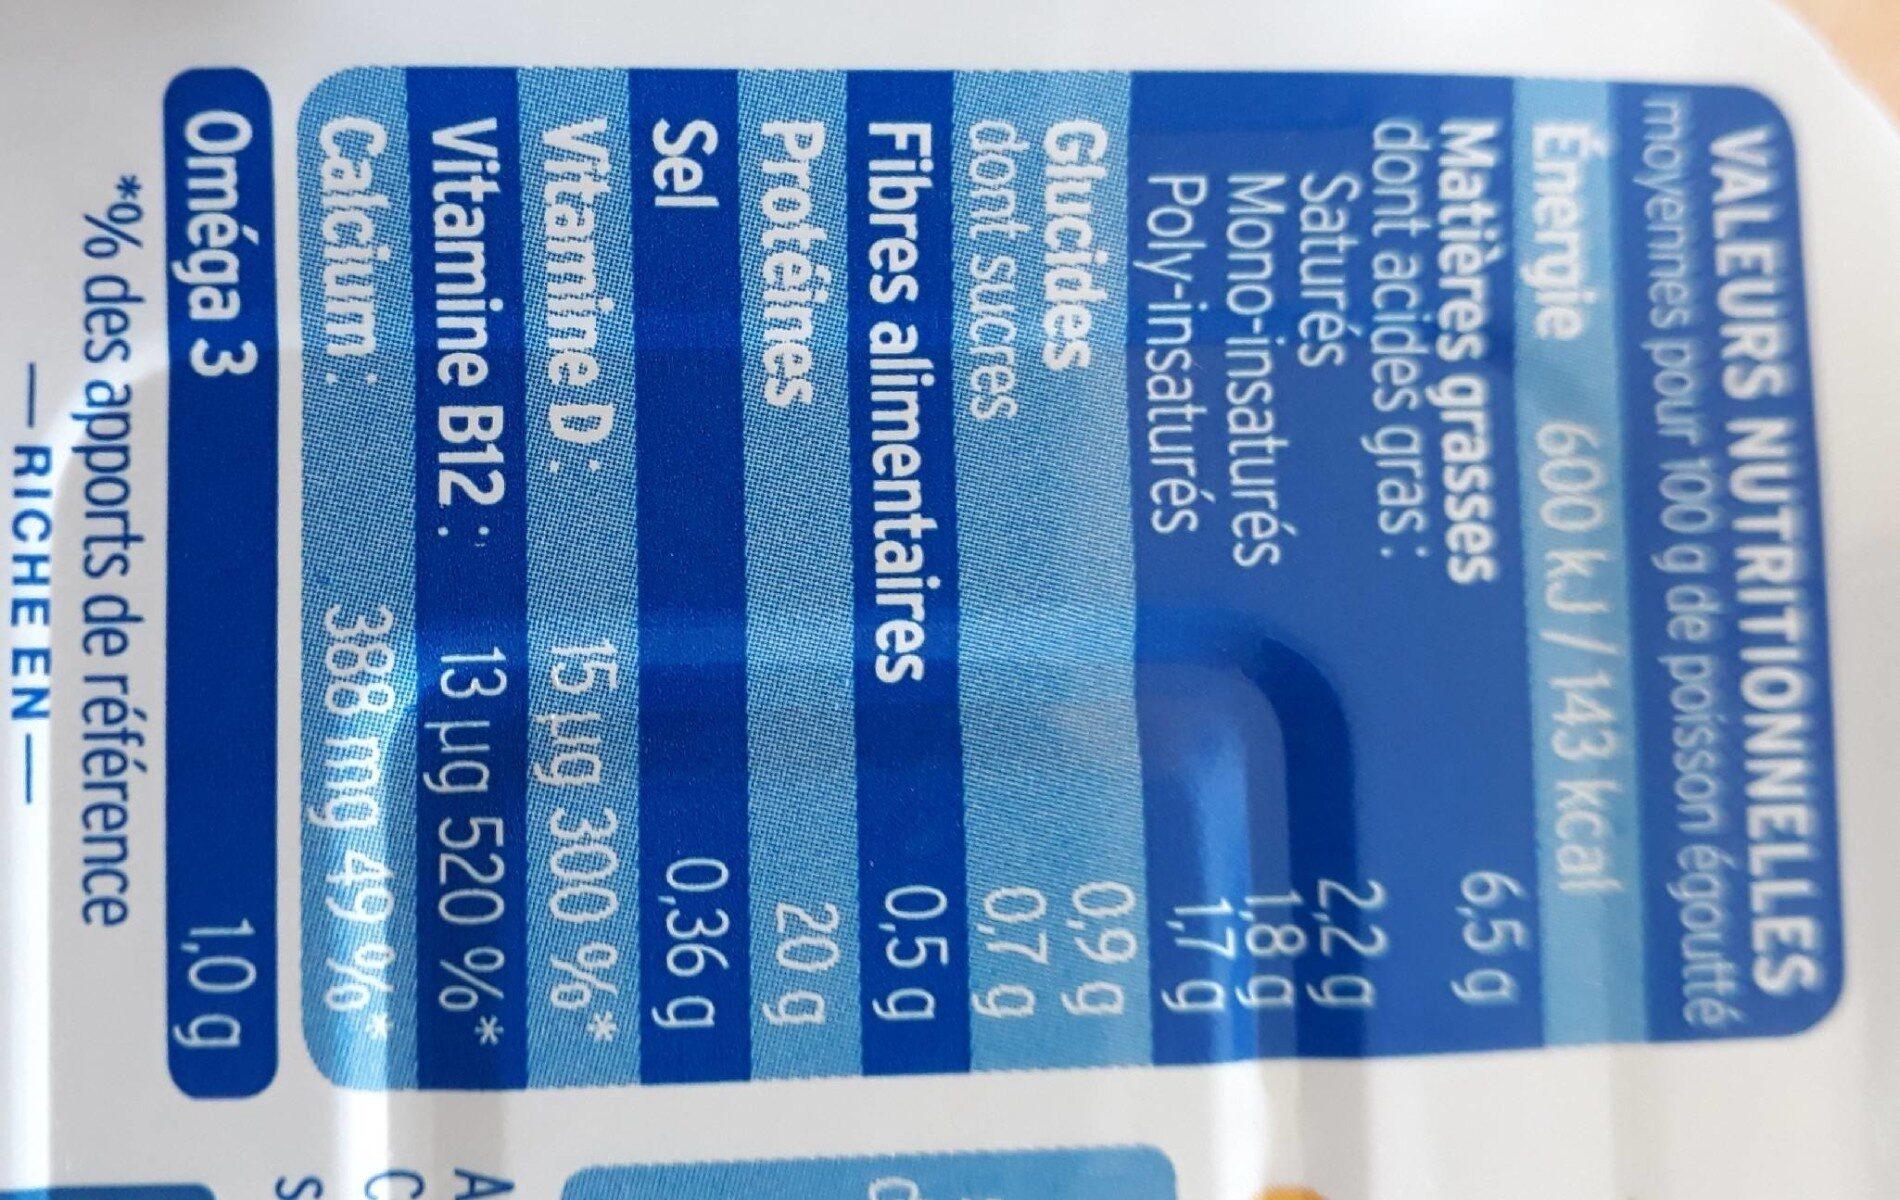 Sardines Marinade sans huile au citron Bio - Informazioni nutrizionali - fr